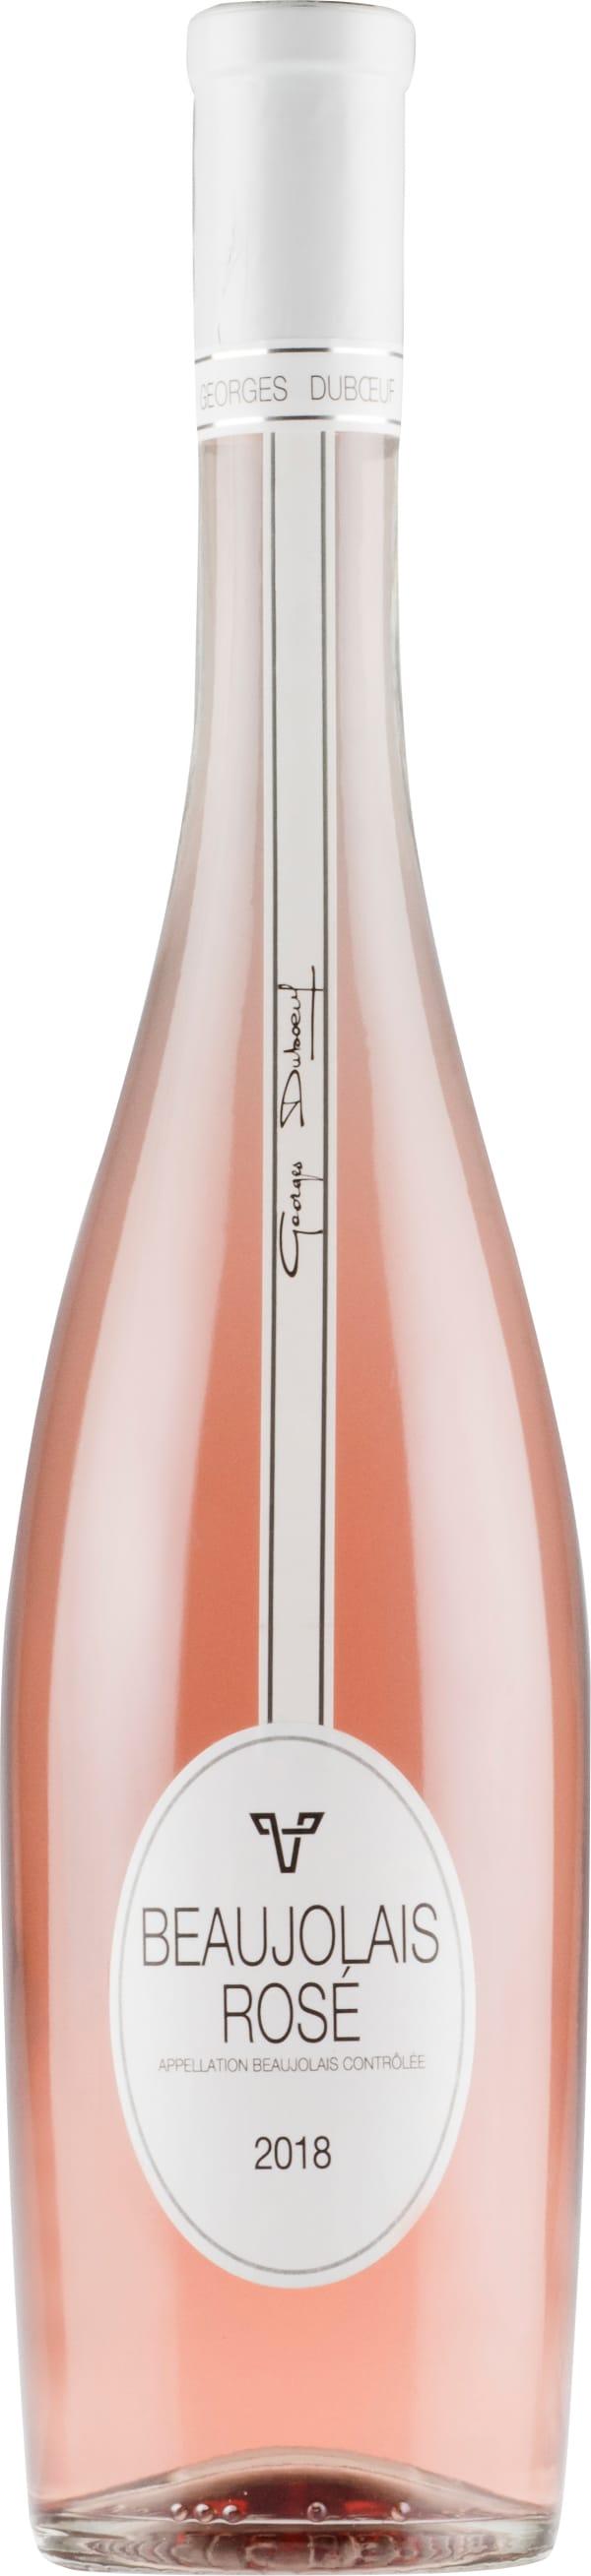 Georges Duboeuf Beaujolais Rosé 2018